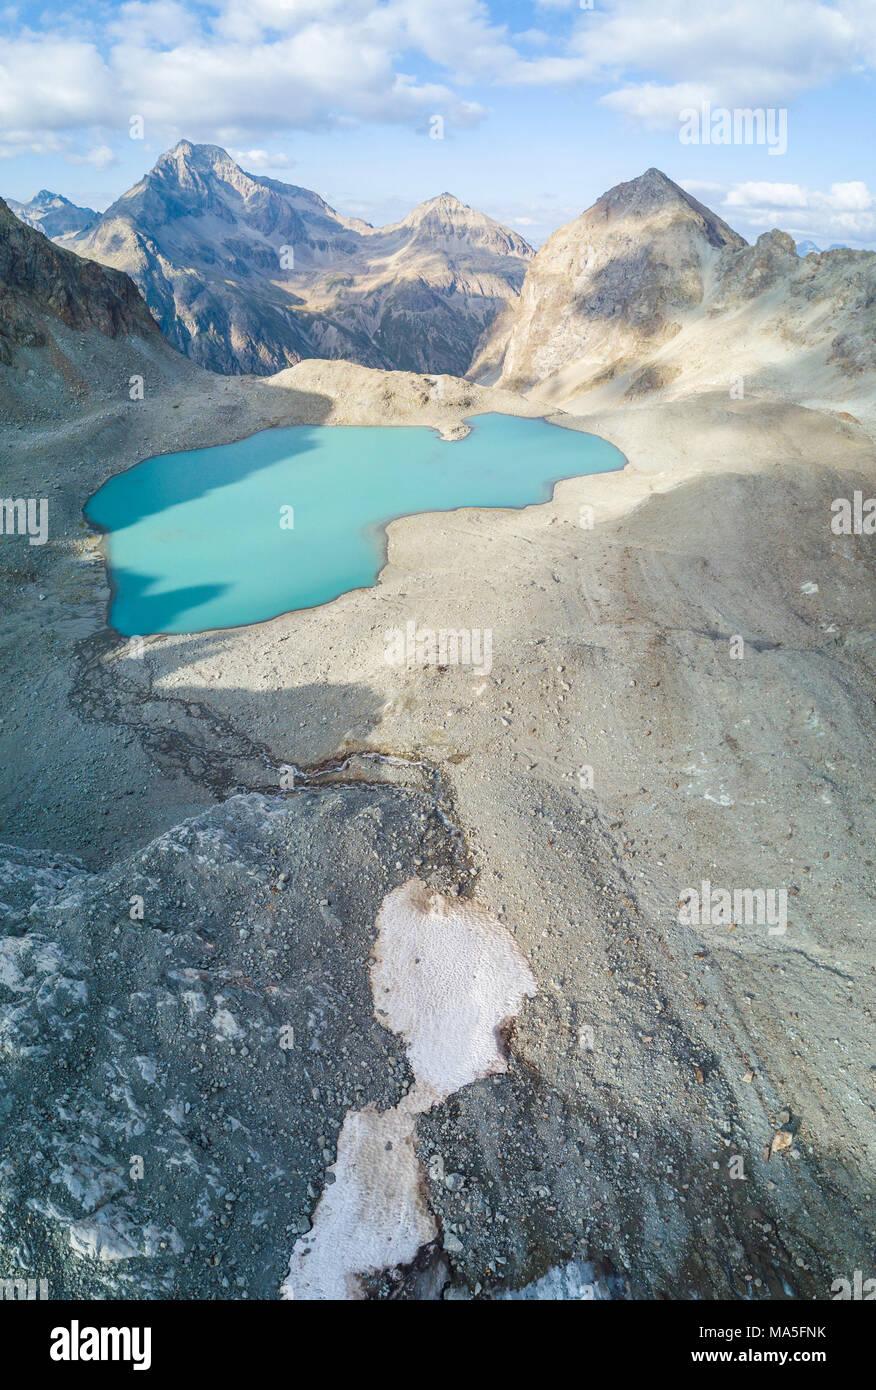 Panoramic of Lej Lagrev seen from drone, Silvaplana, canton of Graubünden, Engadine, Switzerland - Stock Image